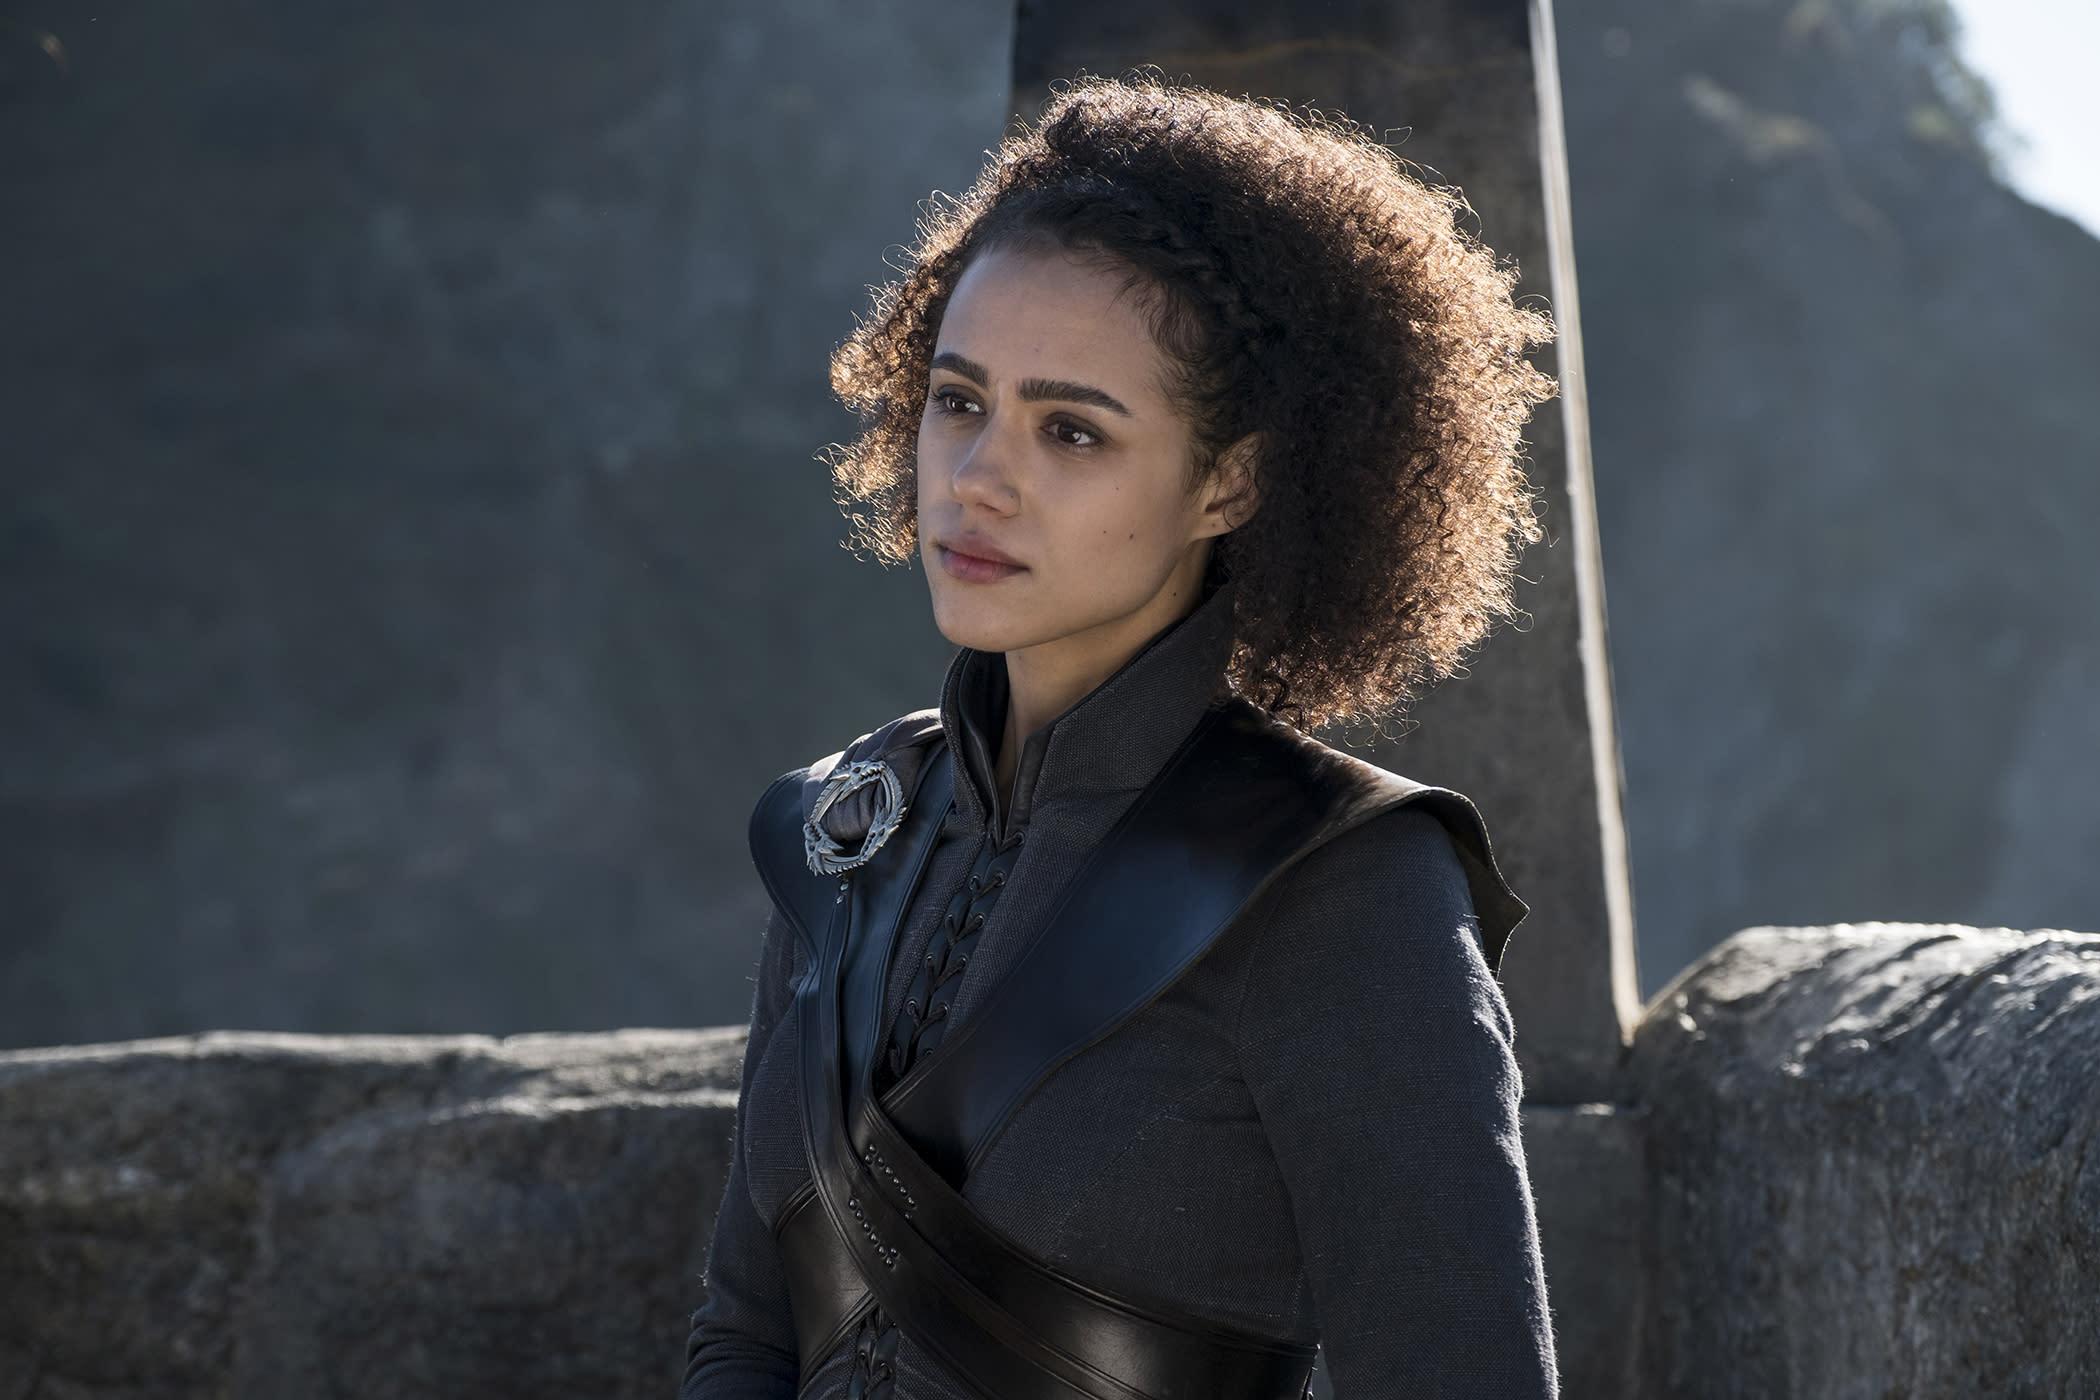 Game Of Thrones star Nathalie Emmanuel lauds Missandeis